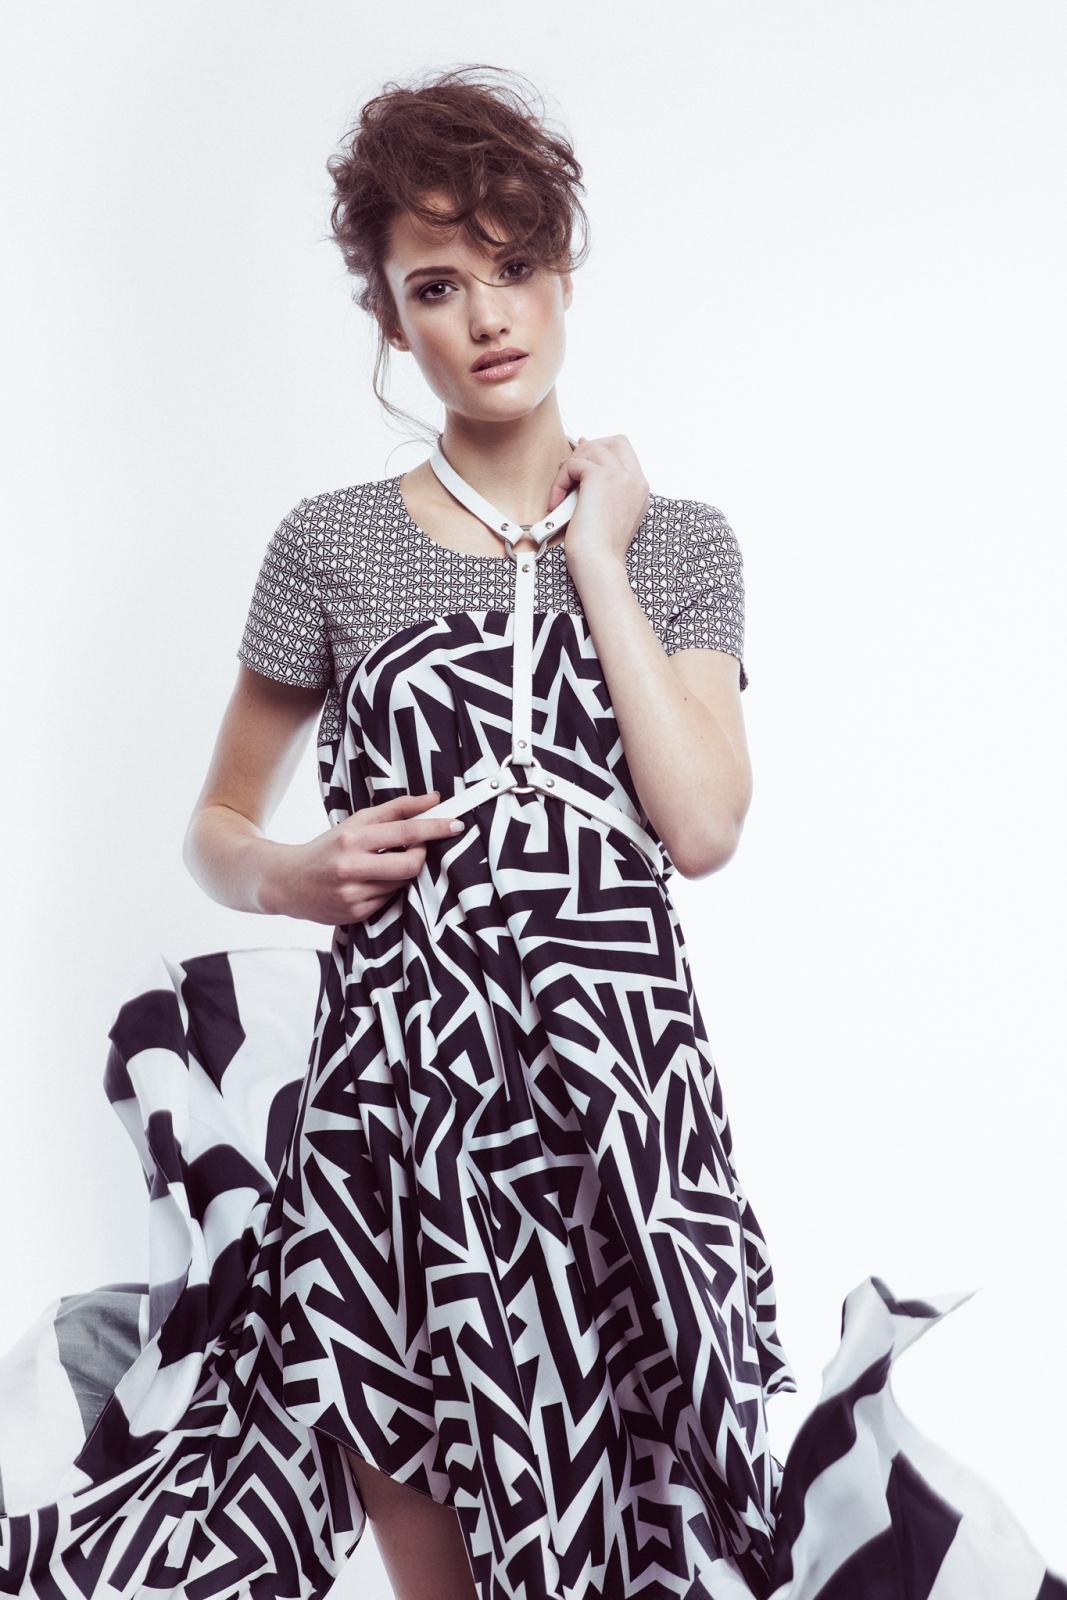 Model: Kinga Trojan / D'vision   Stylist: Ewa Michalik   MUA: Vika May   Hair: Patryk Nadolny